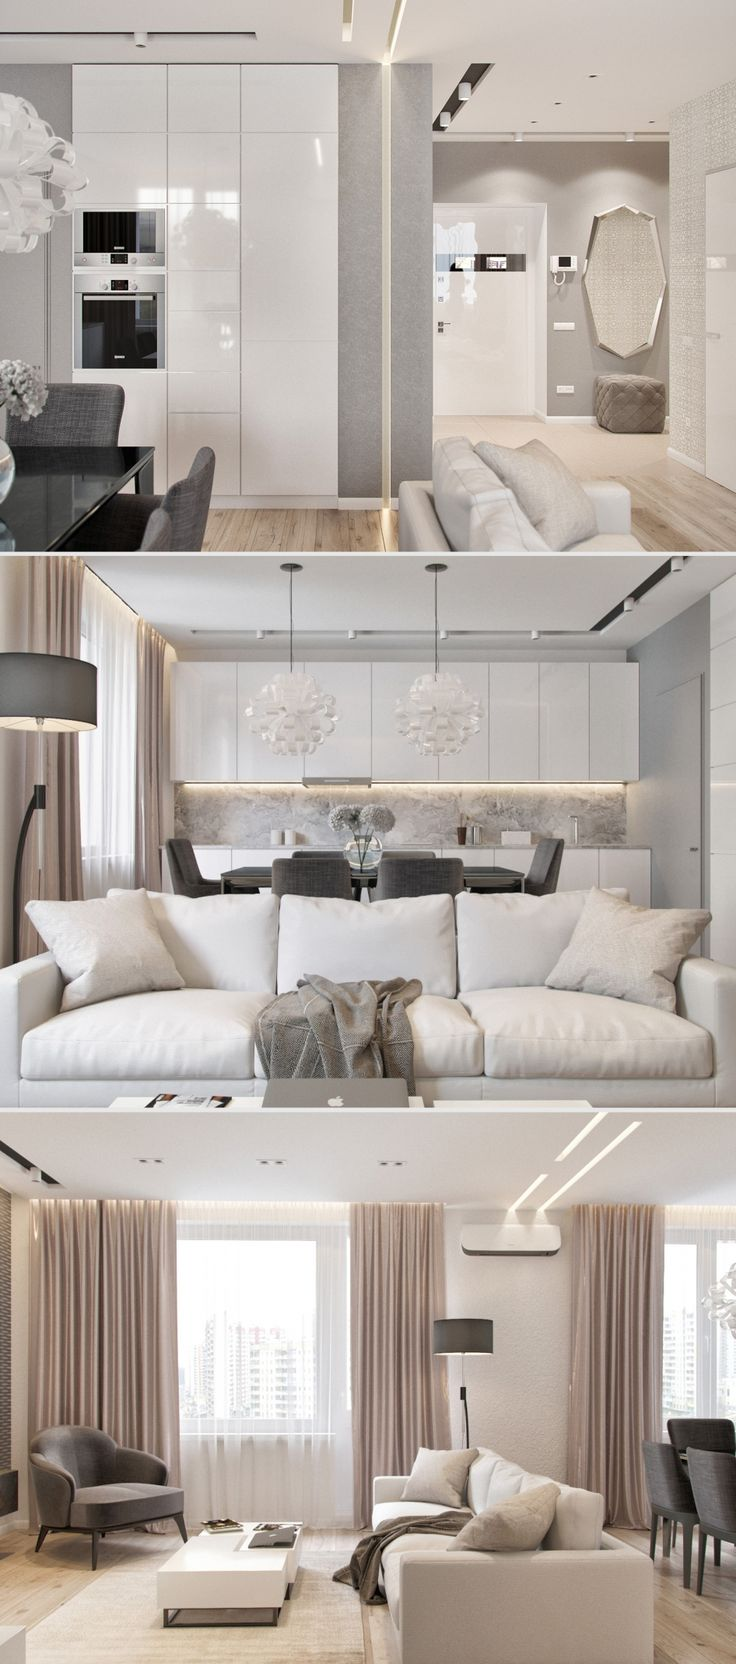 Квартира 105 кв.м - Галерея 3ddd.ru